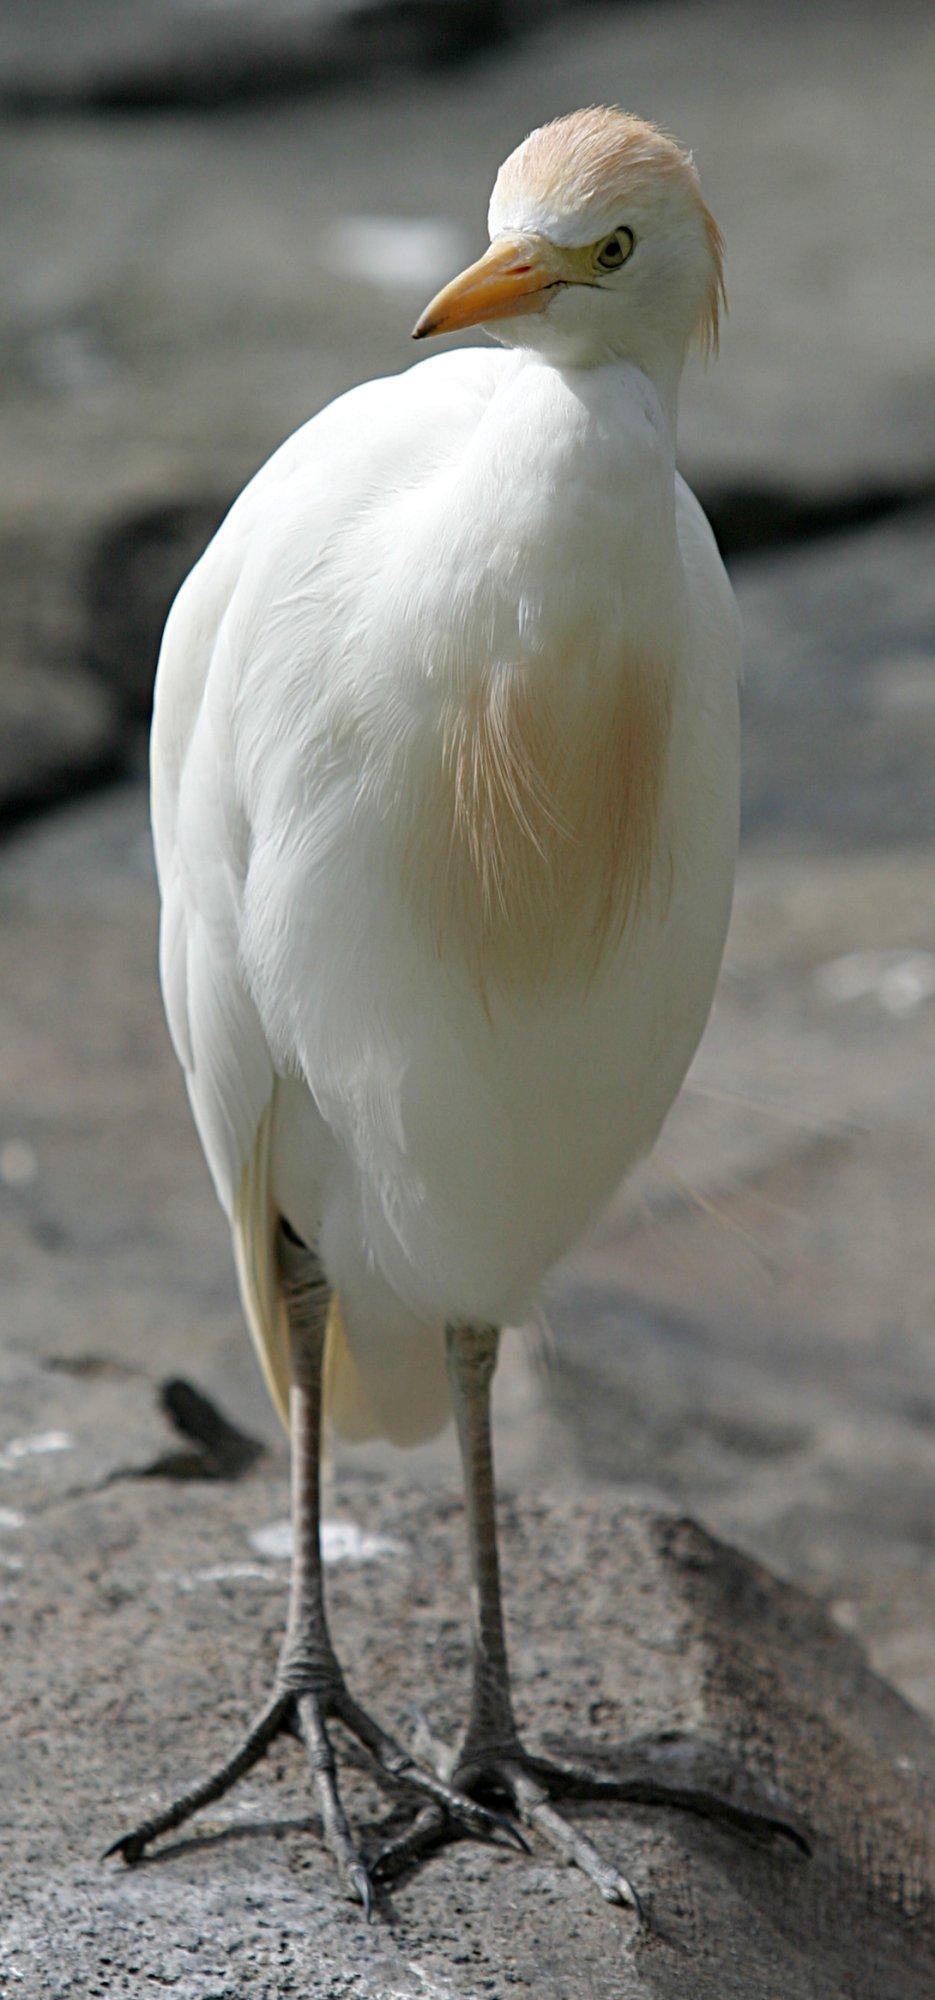 Cattle egret - Wikipedia